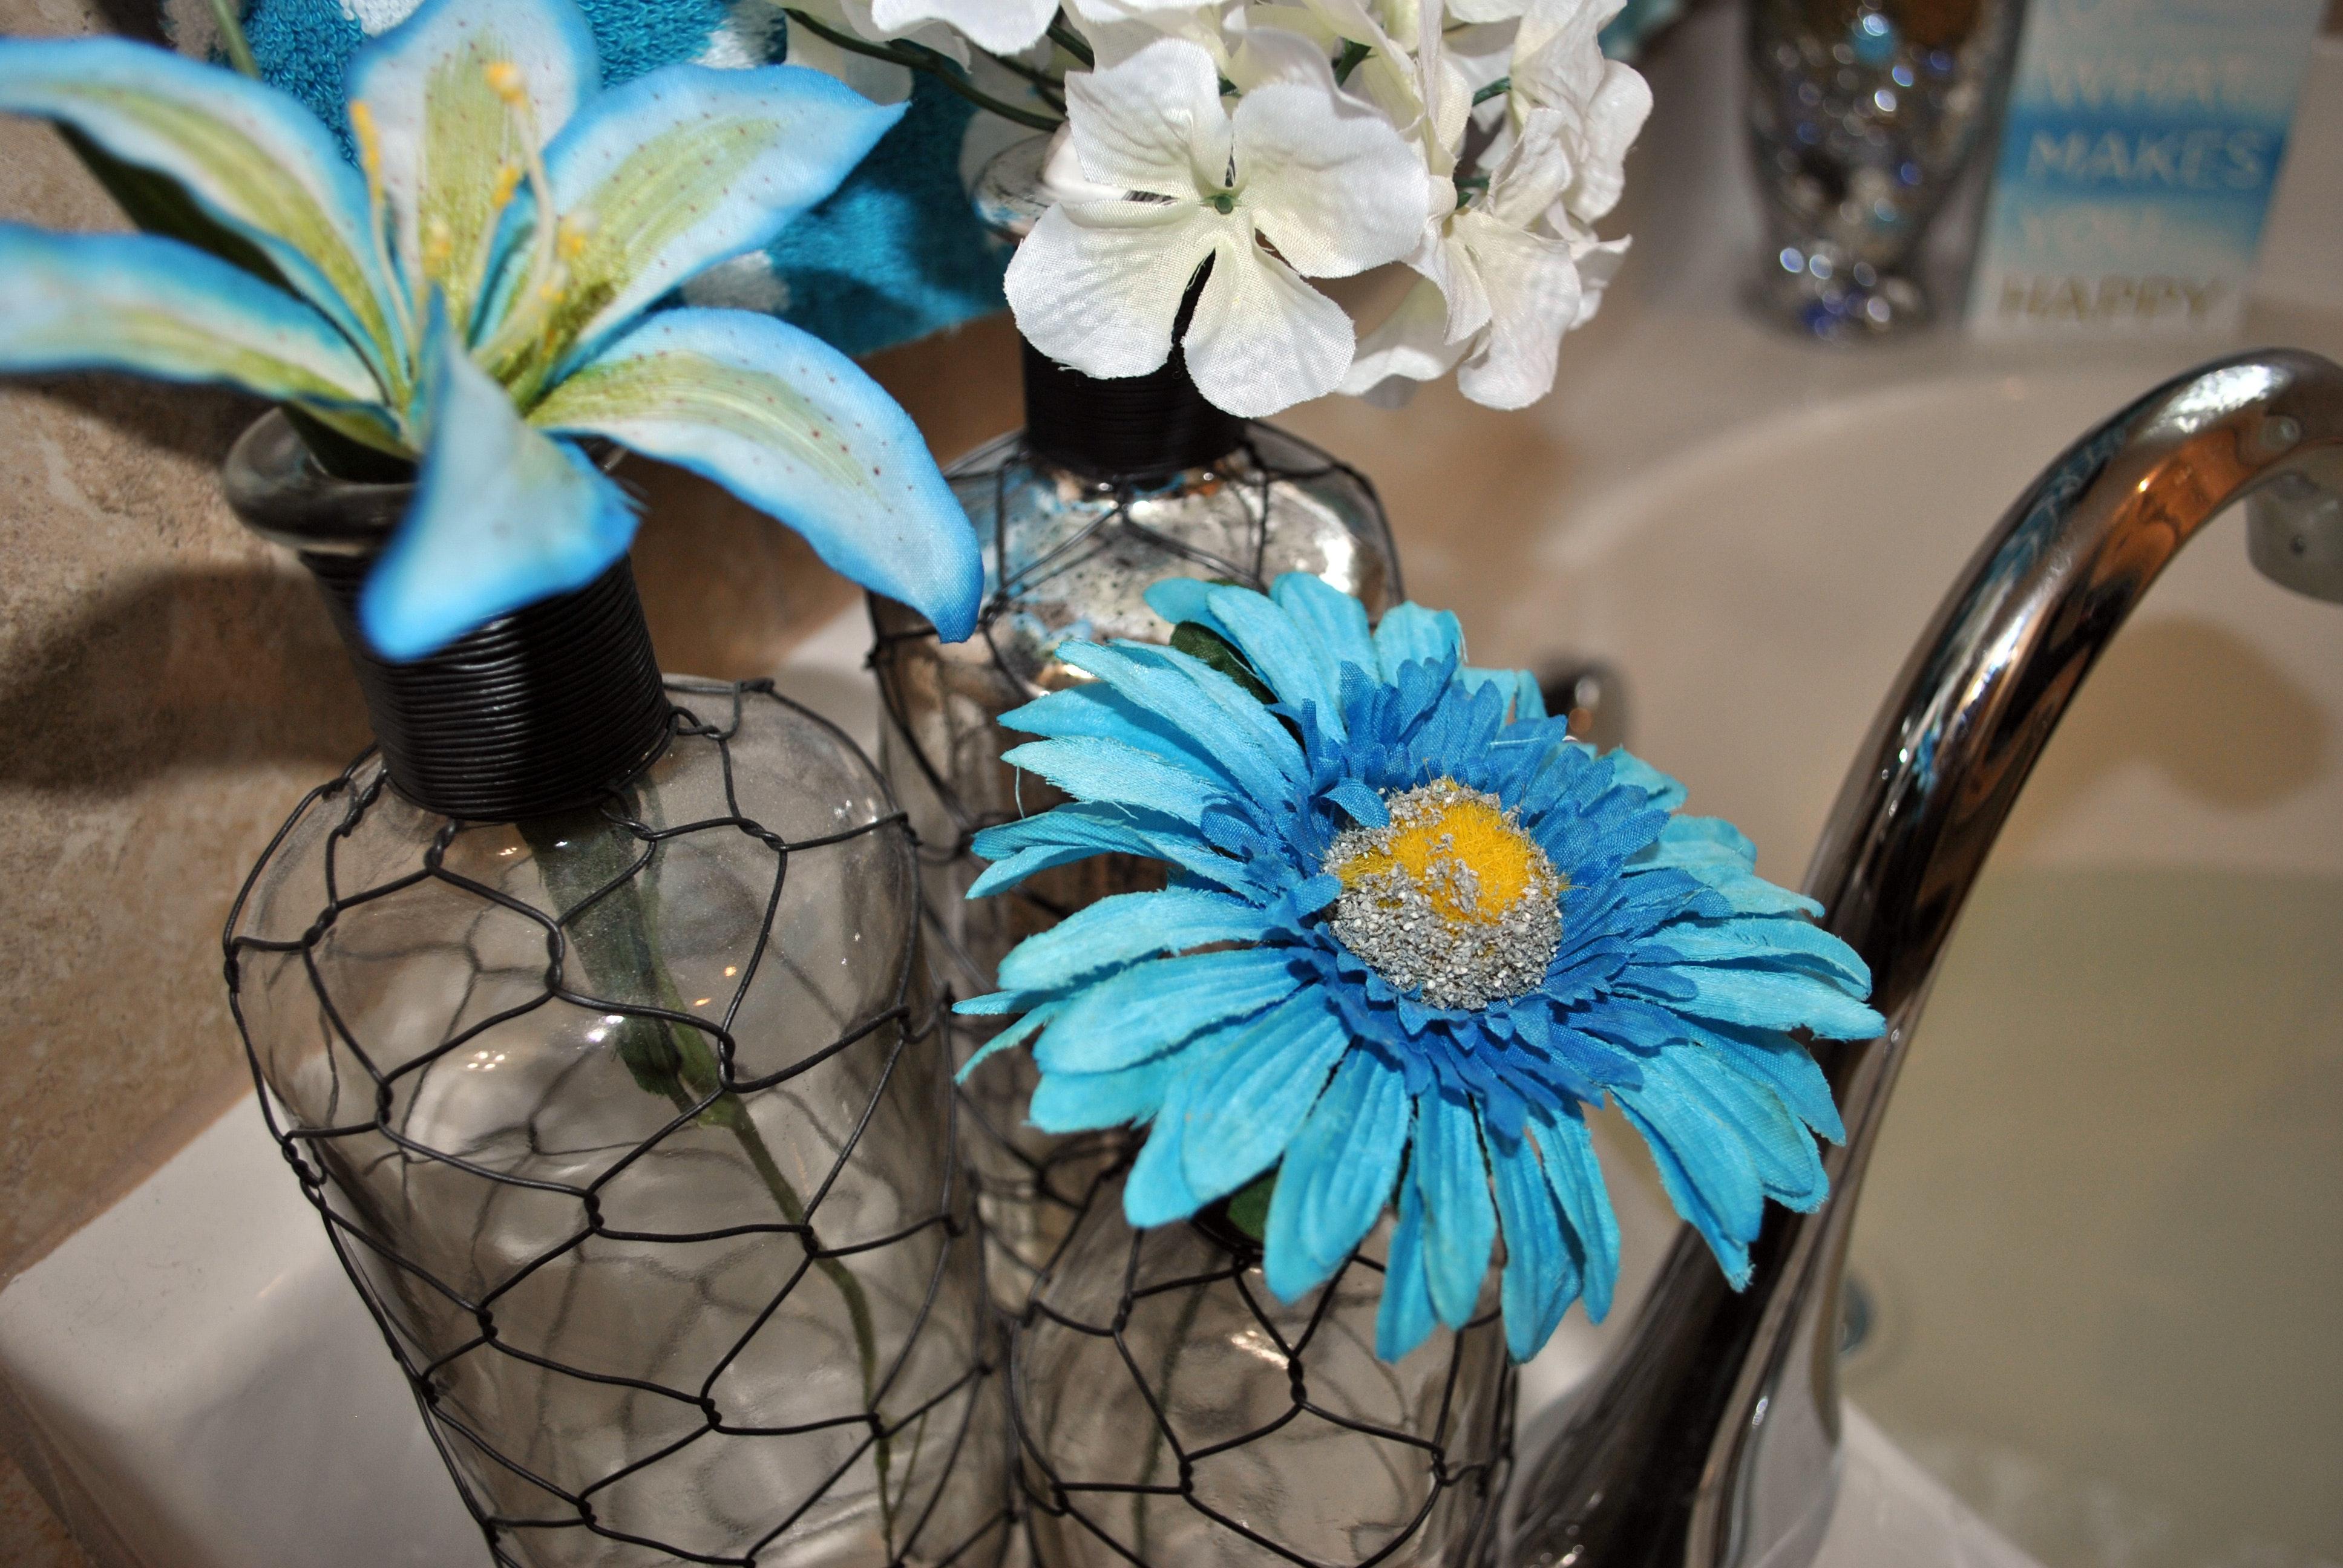 Free stock photo of bath, bathtub, blue